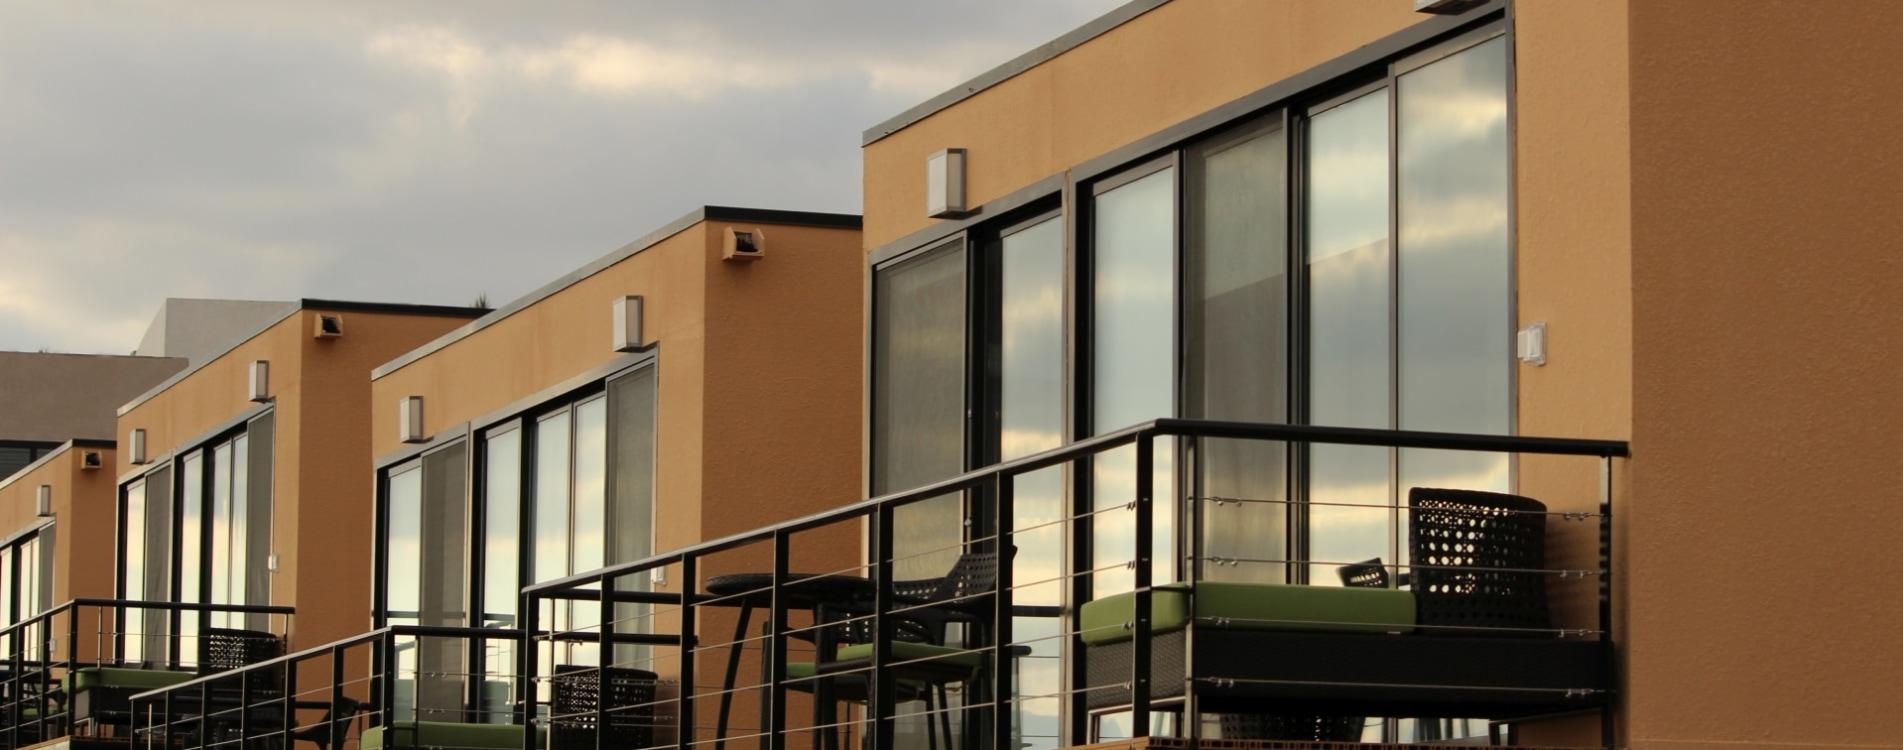 The-View-Oman-Unterkünfte-Balkon-Exterior.JPG